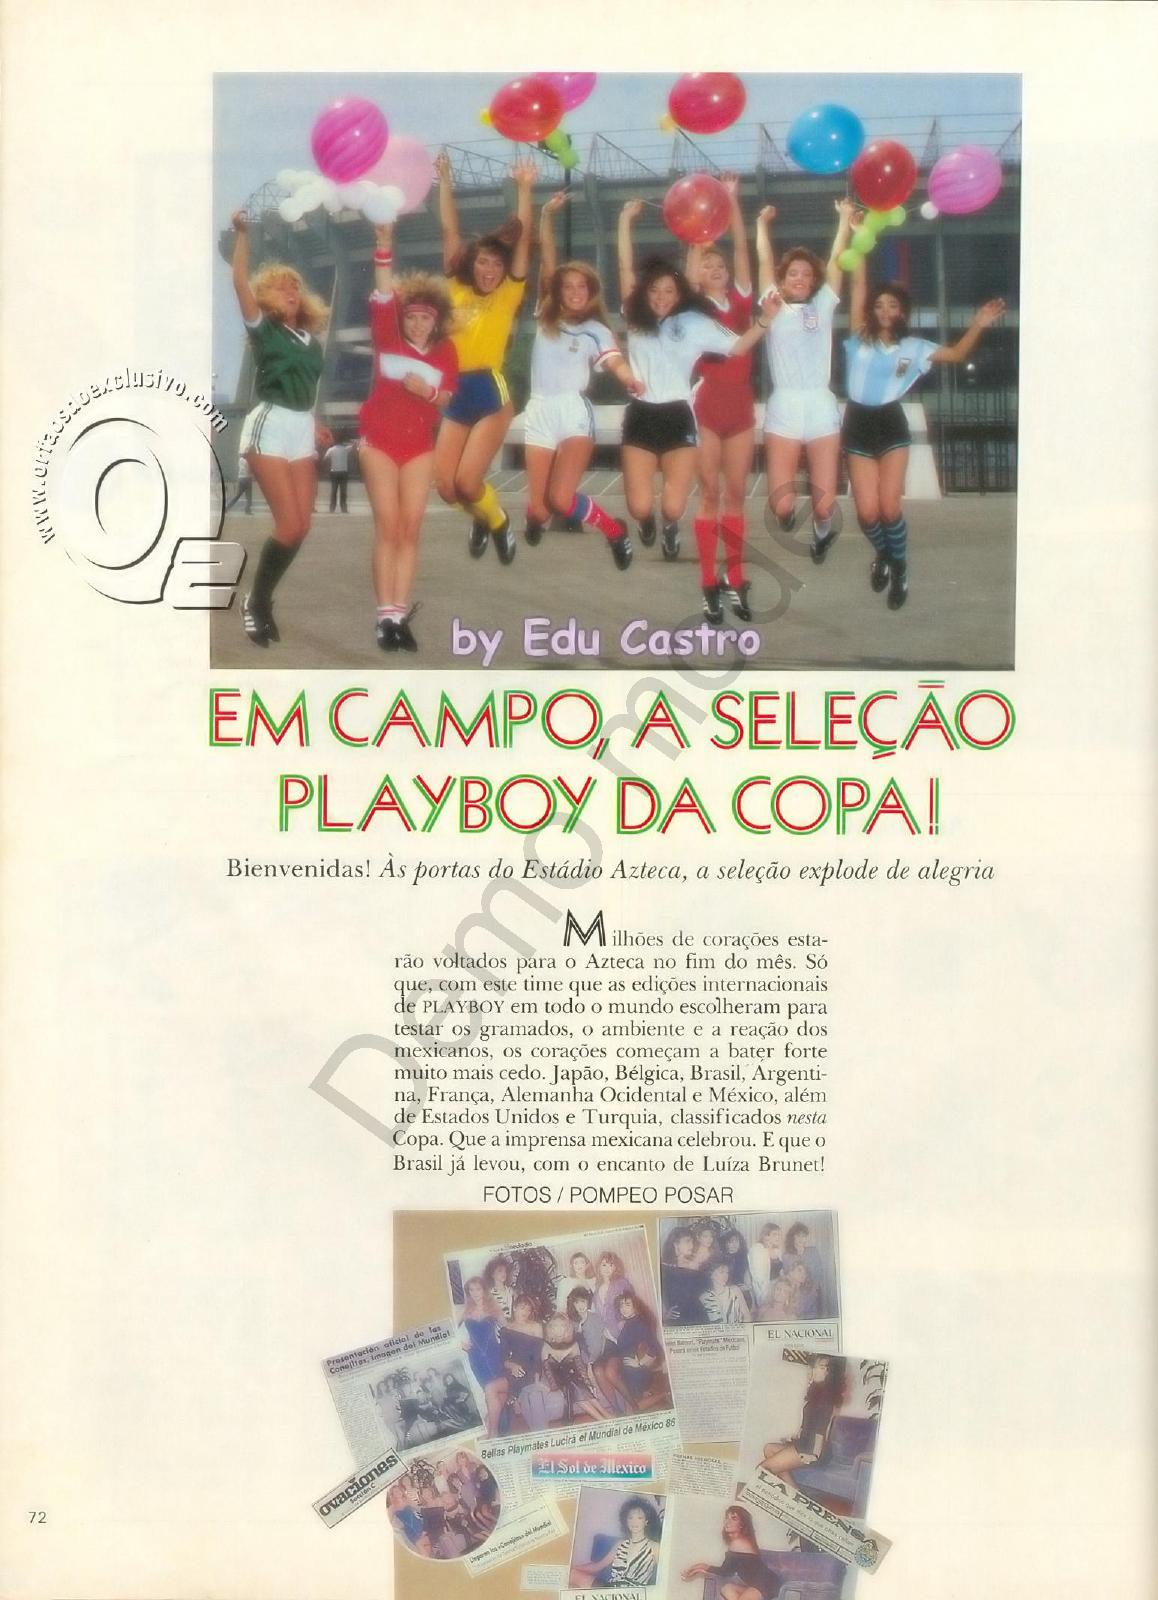 Fotos Luiza Brunet nua, Fotos da Luiza Brunet na playboy, todas as fotos pelada, playboy de maio de 1986